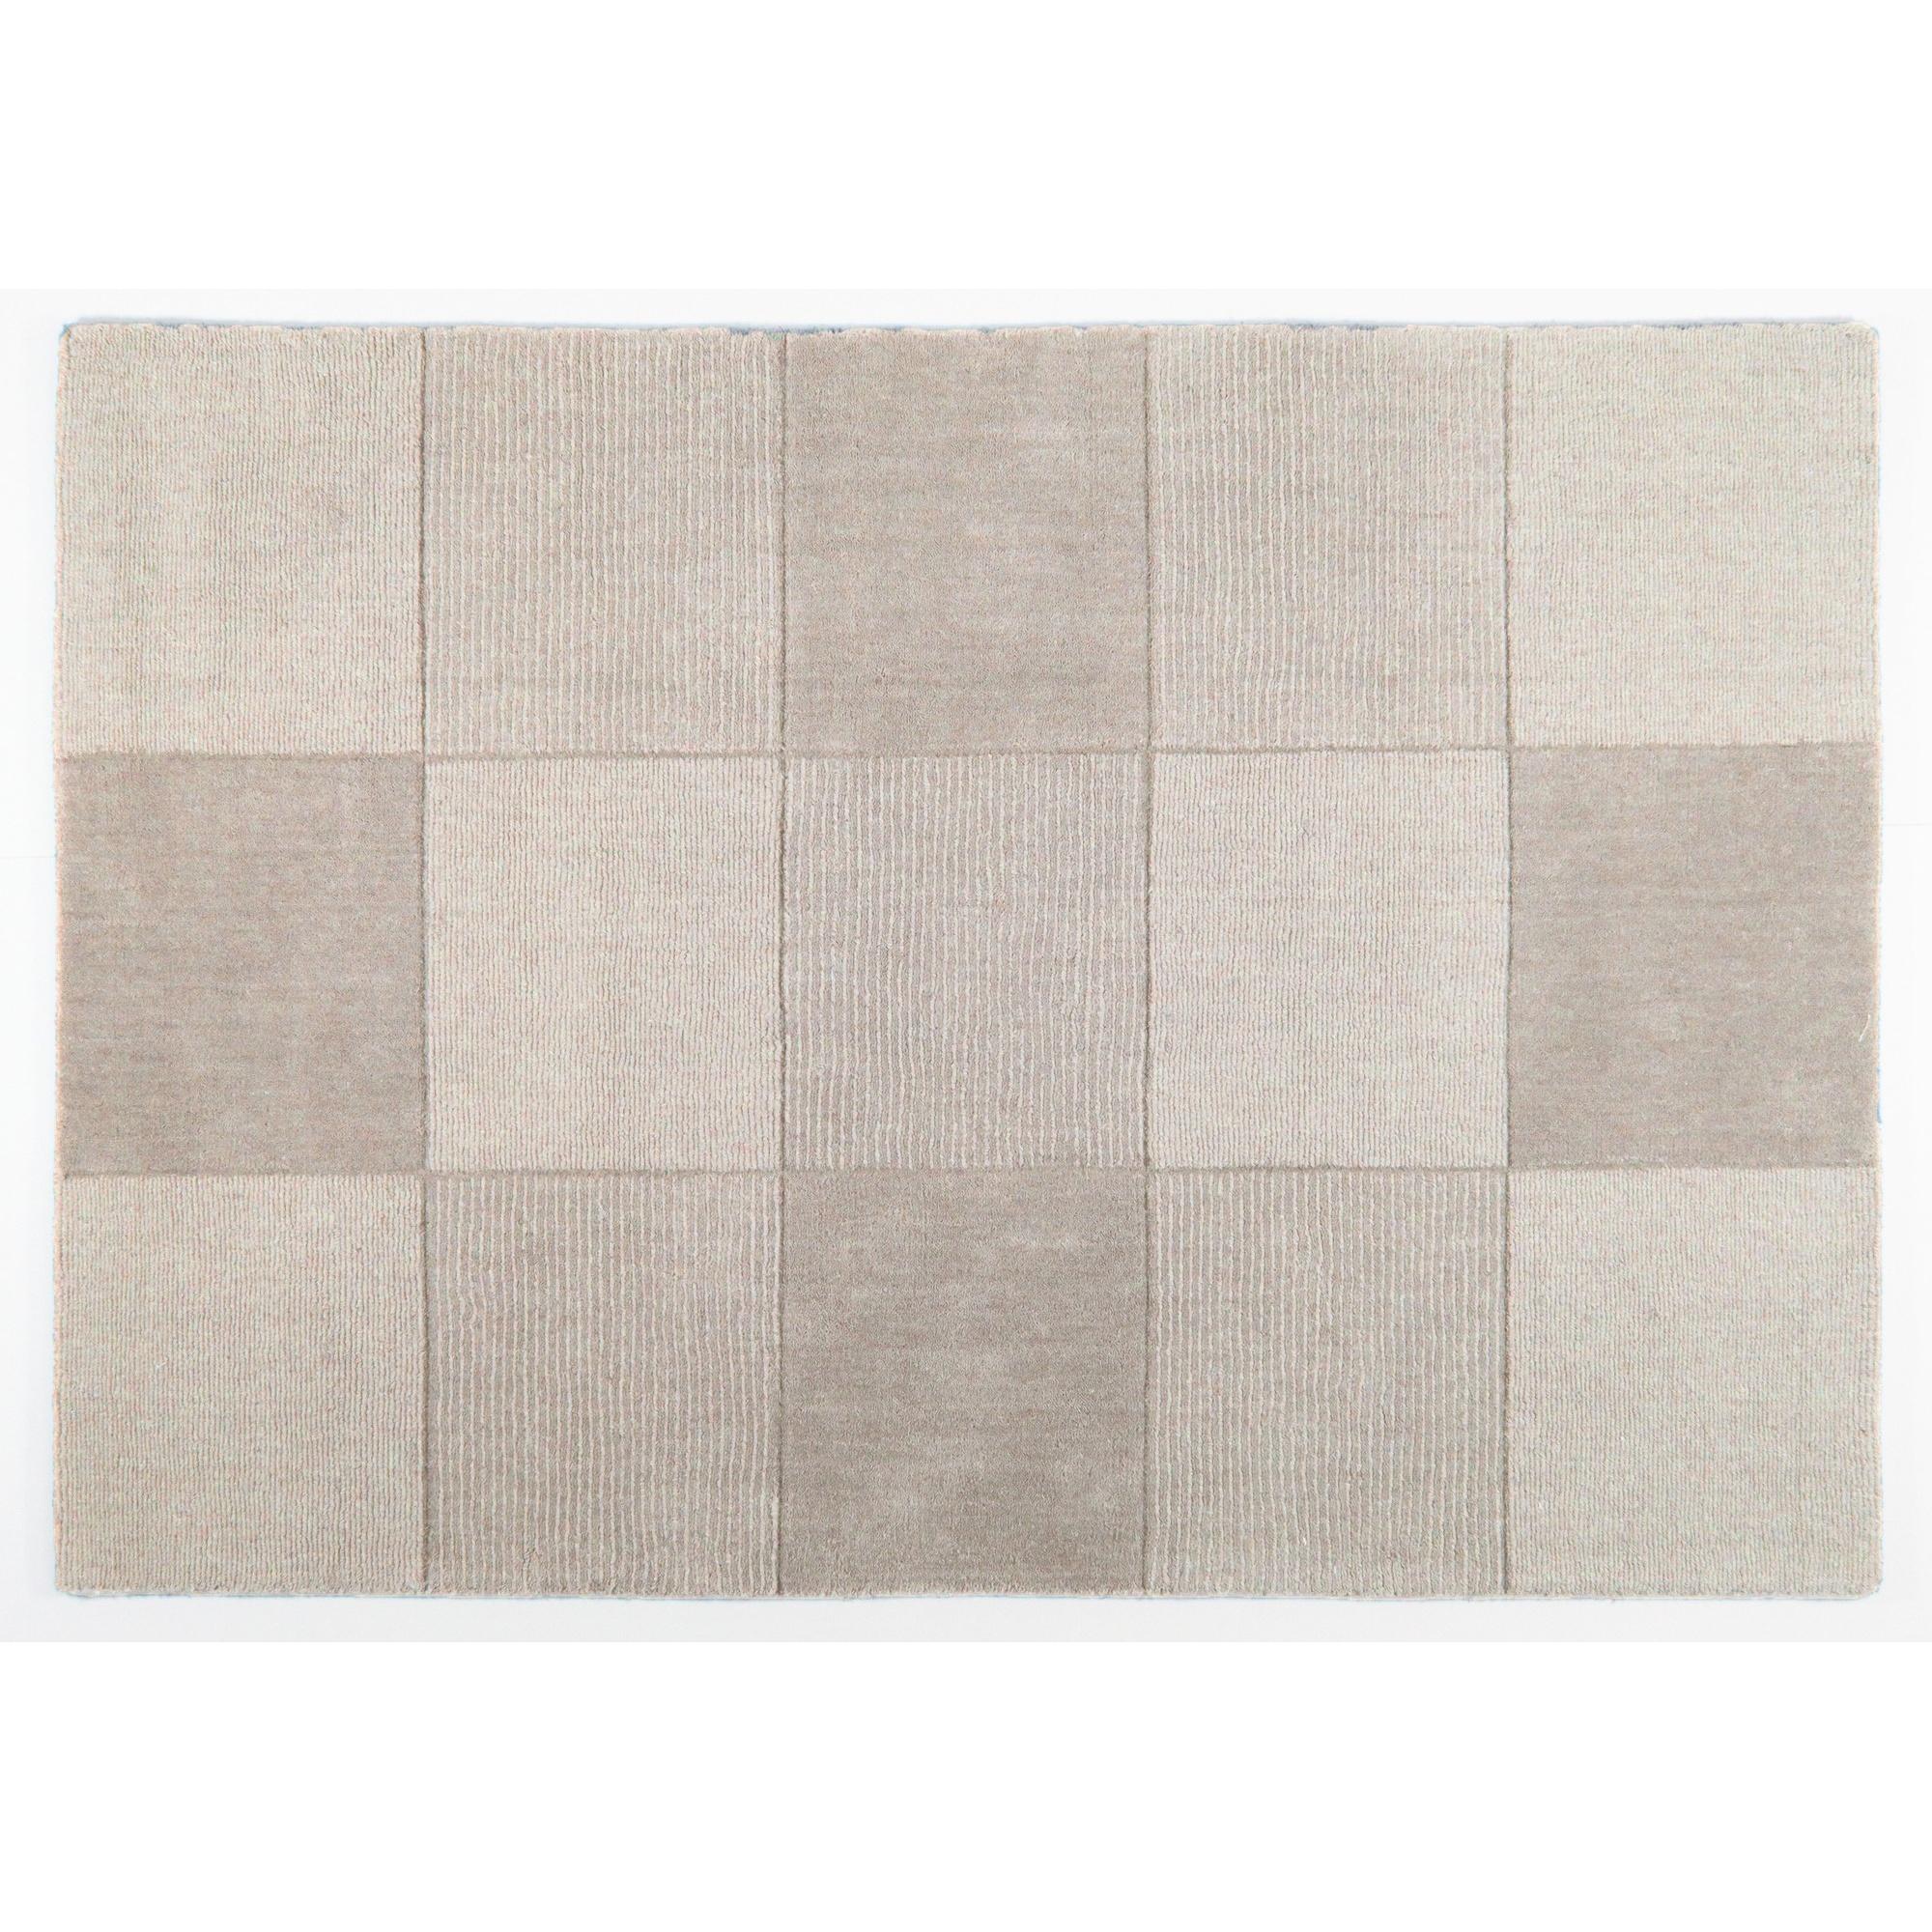 flair rugs tapis 100 laine motifs carr s fr252 ebay. Black Bedroom Furniture Sets. Home Design Ideas